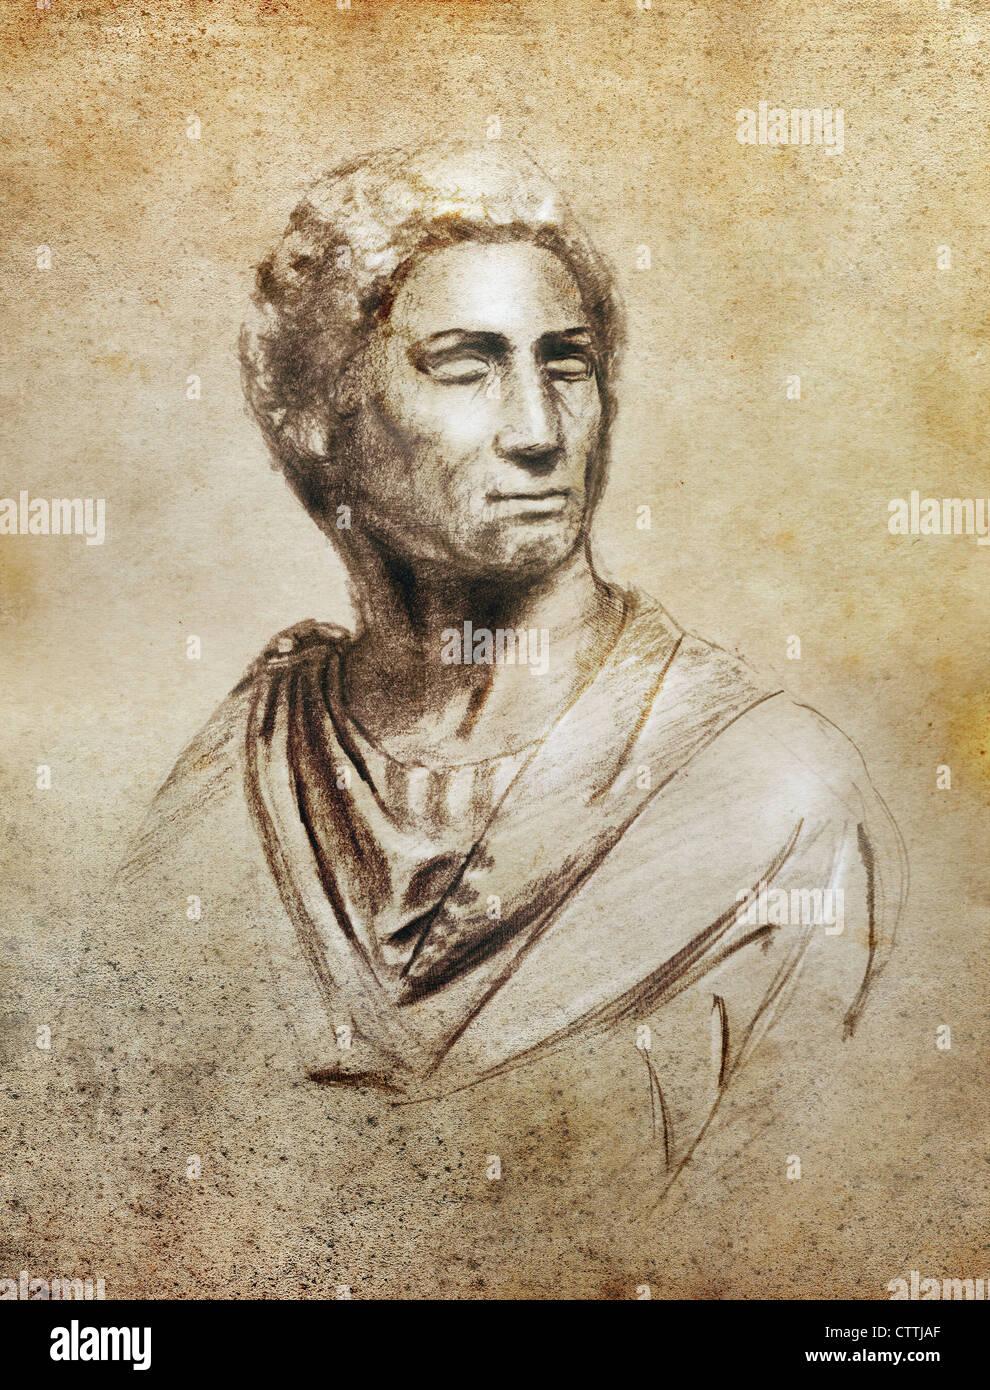 Brutus portrait - Stock Image